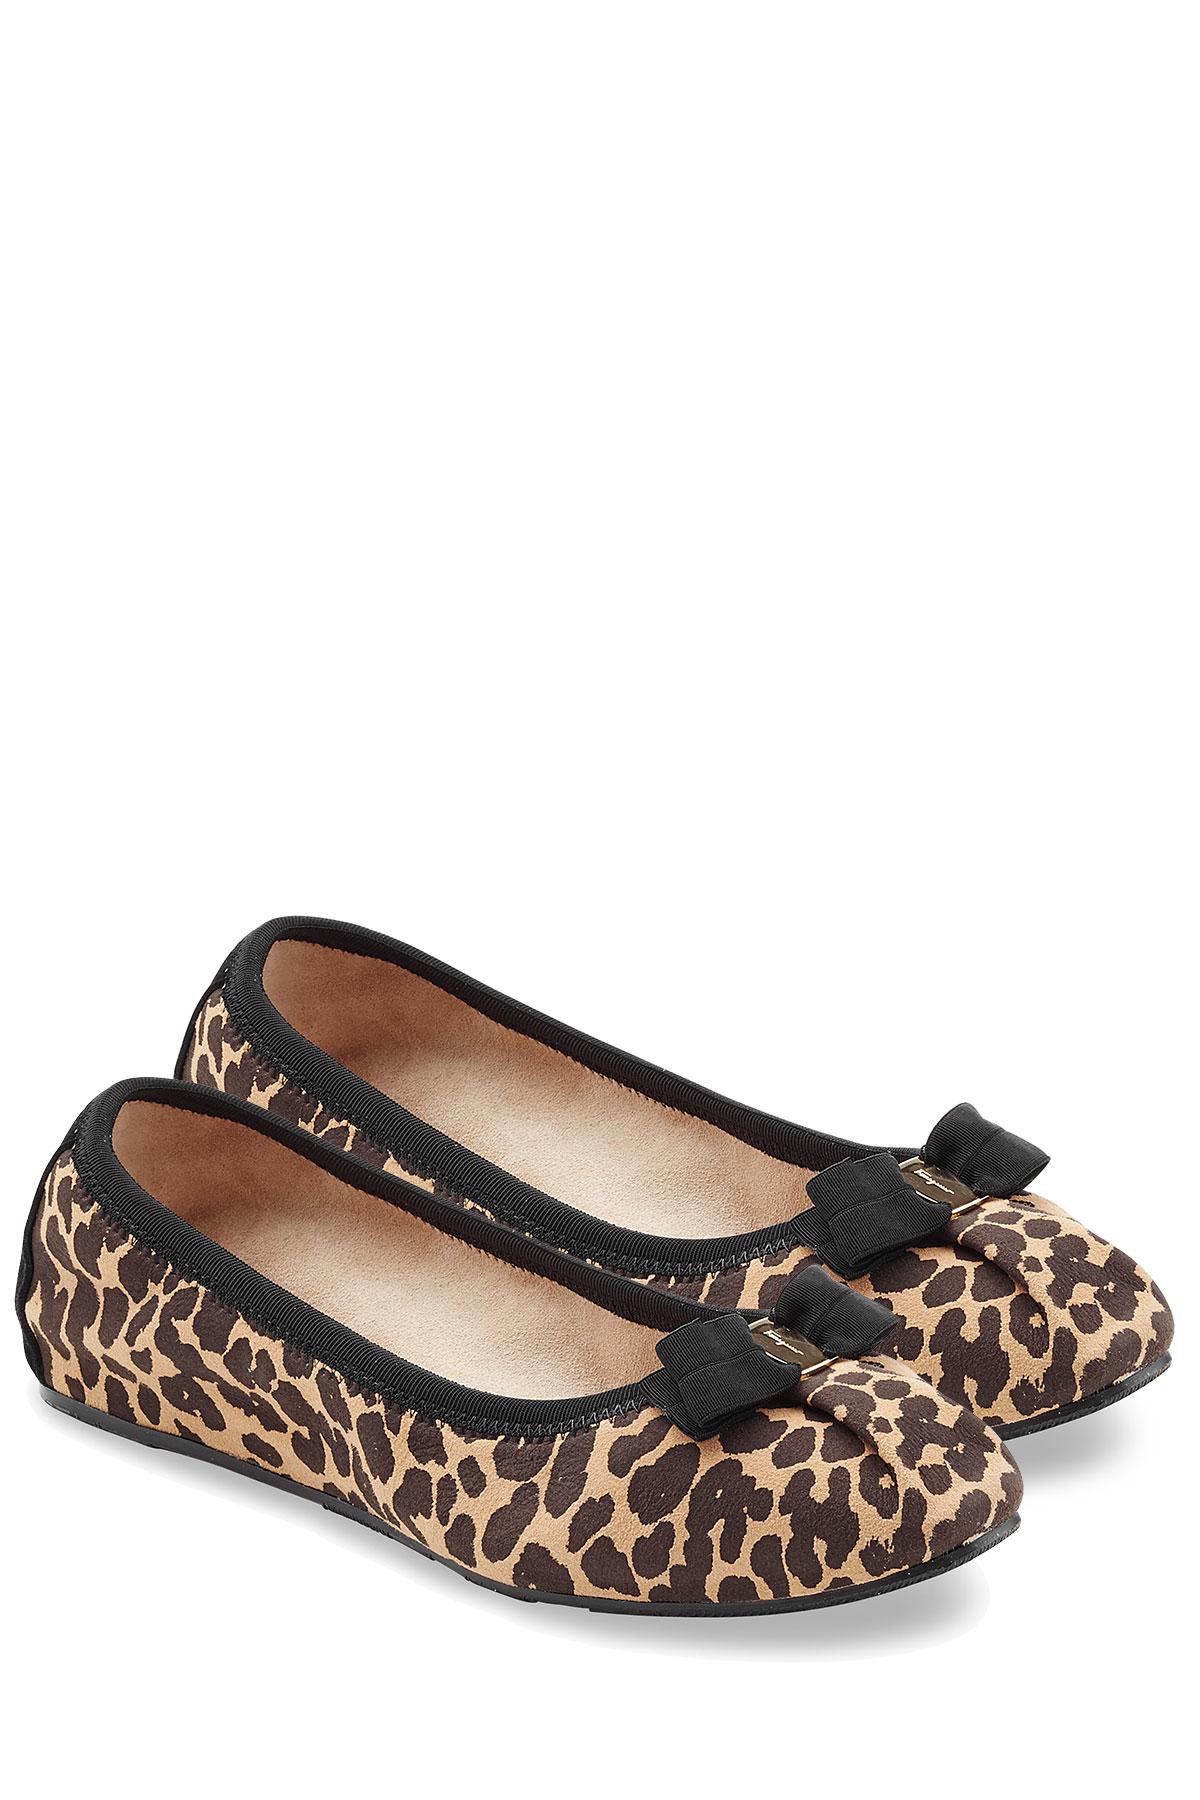 Lyst Ferragamo Suede Leopard Print Ballet Flats Animal